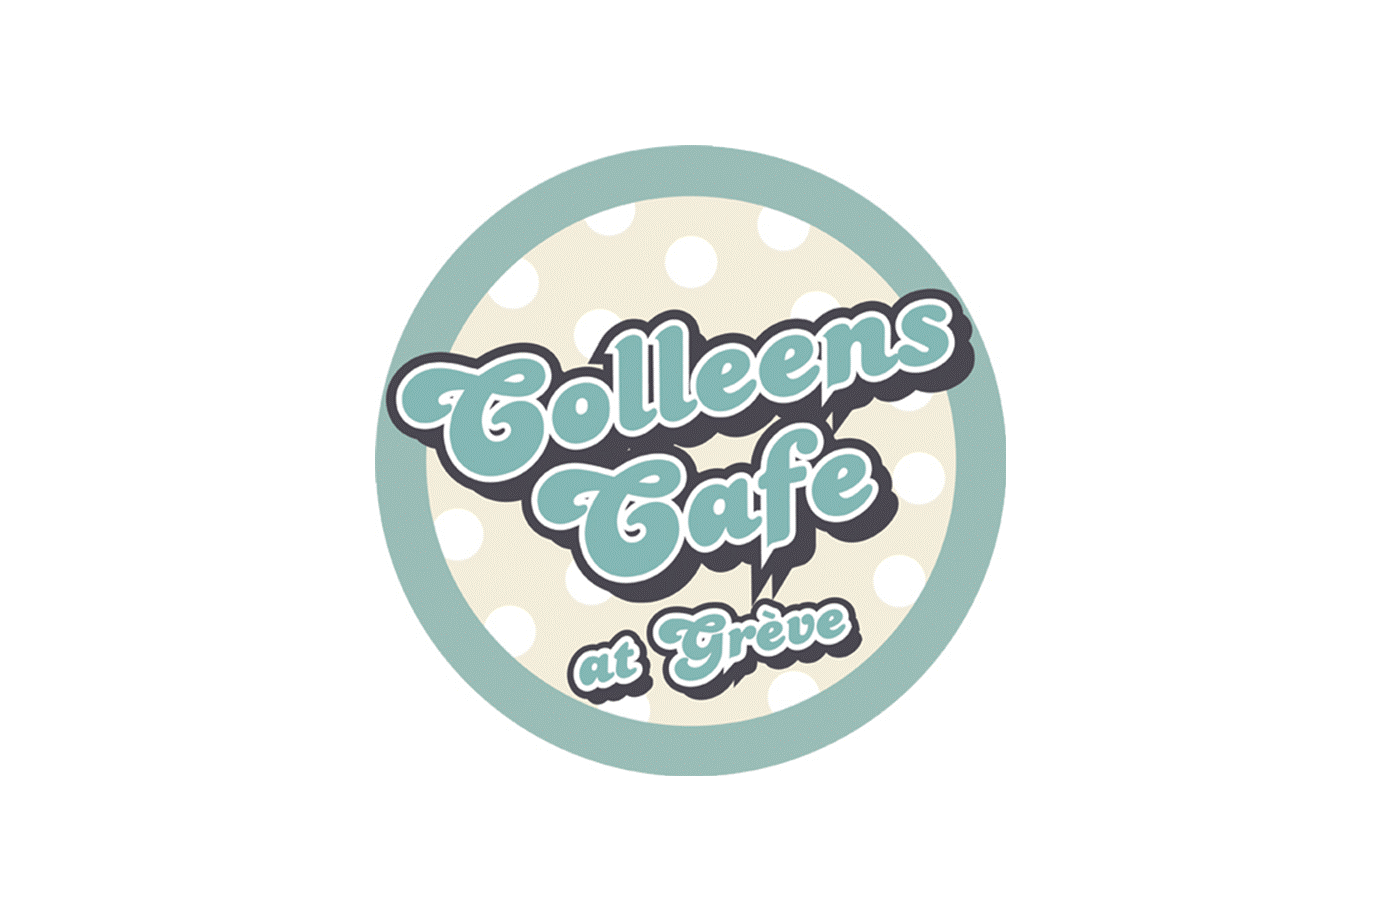 Colleen's Cafe logo